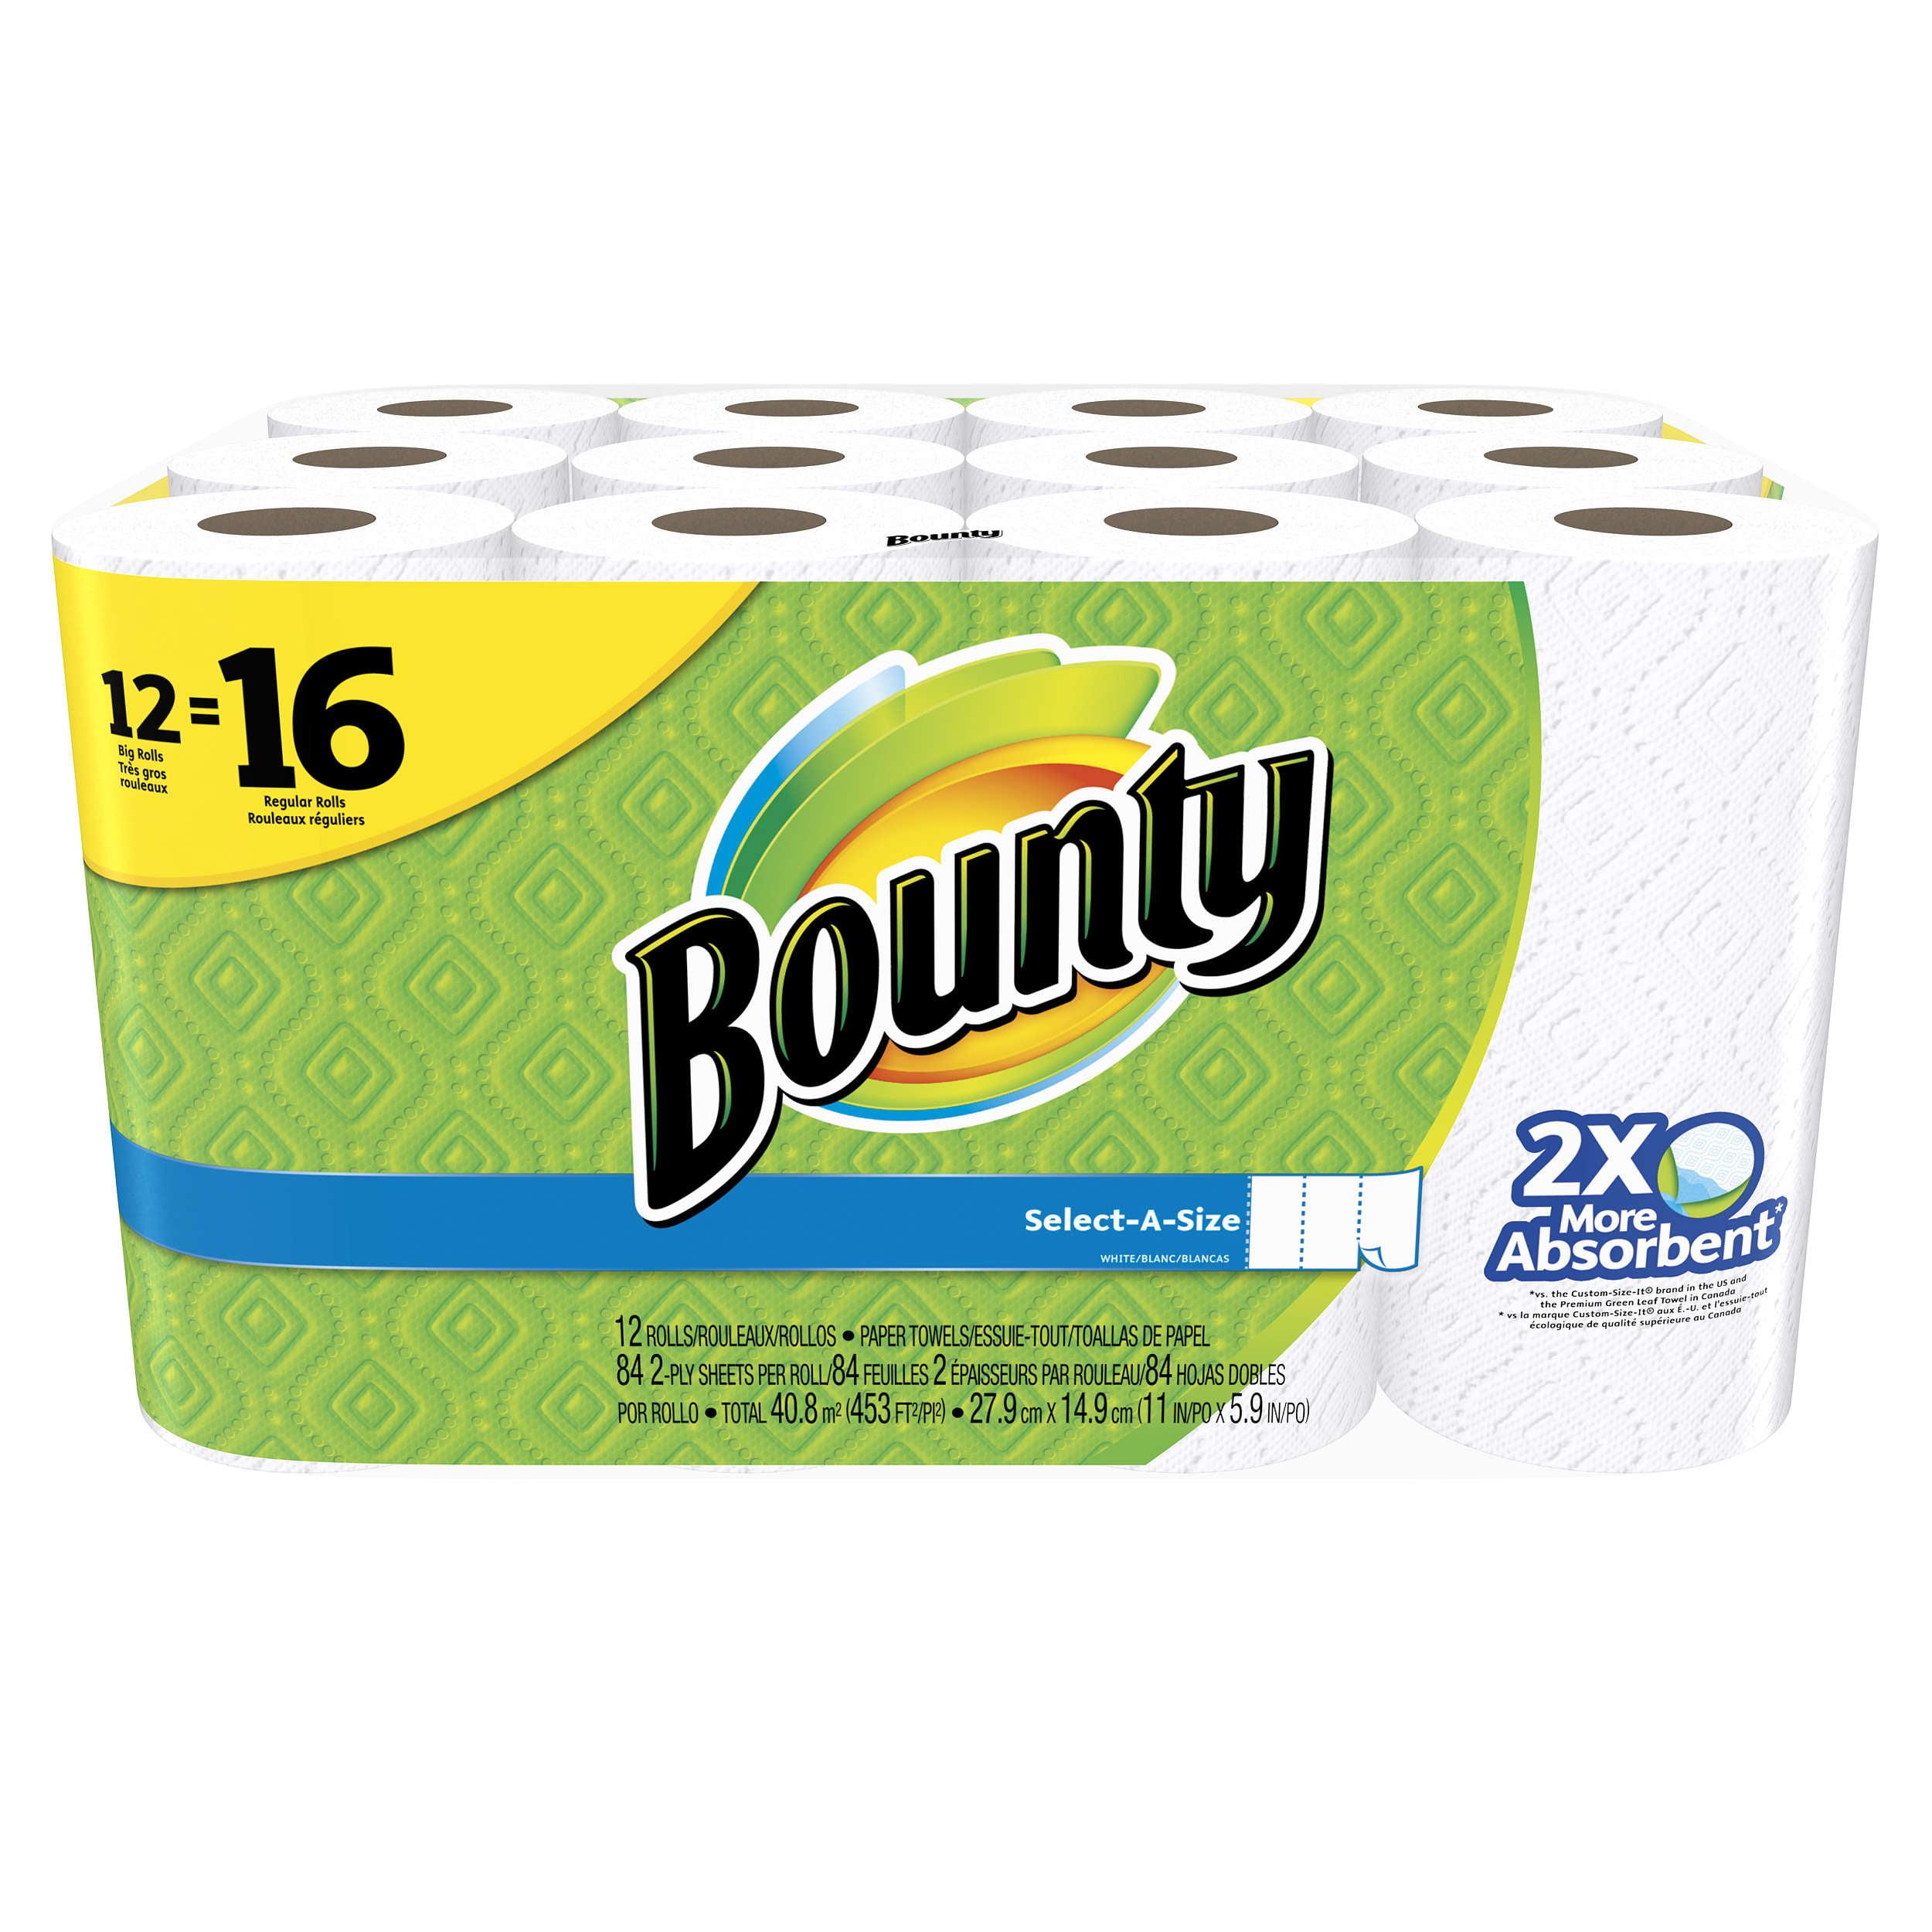 Bounty Select-A-Size Paper Towels, White, 12 Big Rolls = 16 Regular Rolls